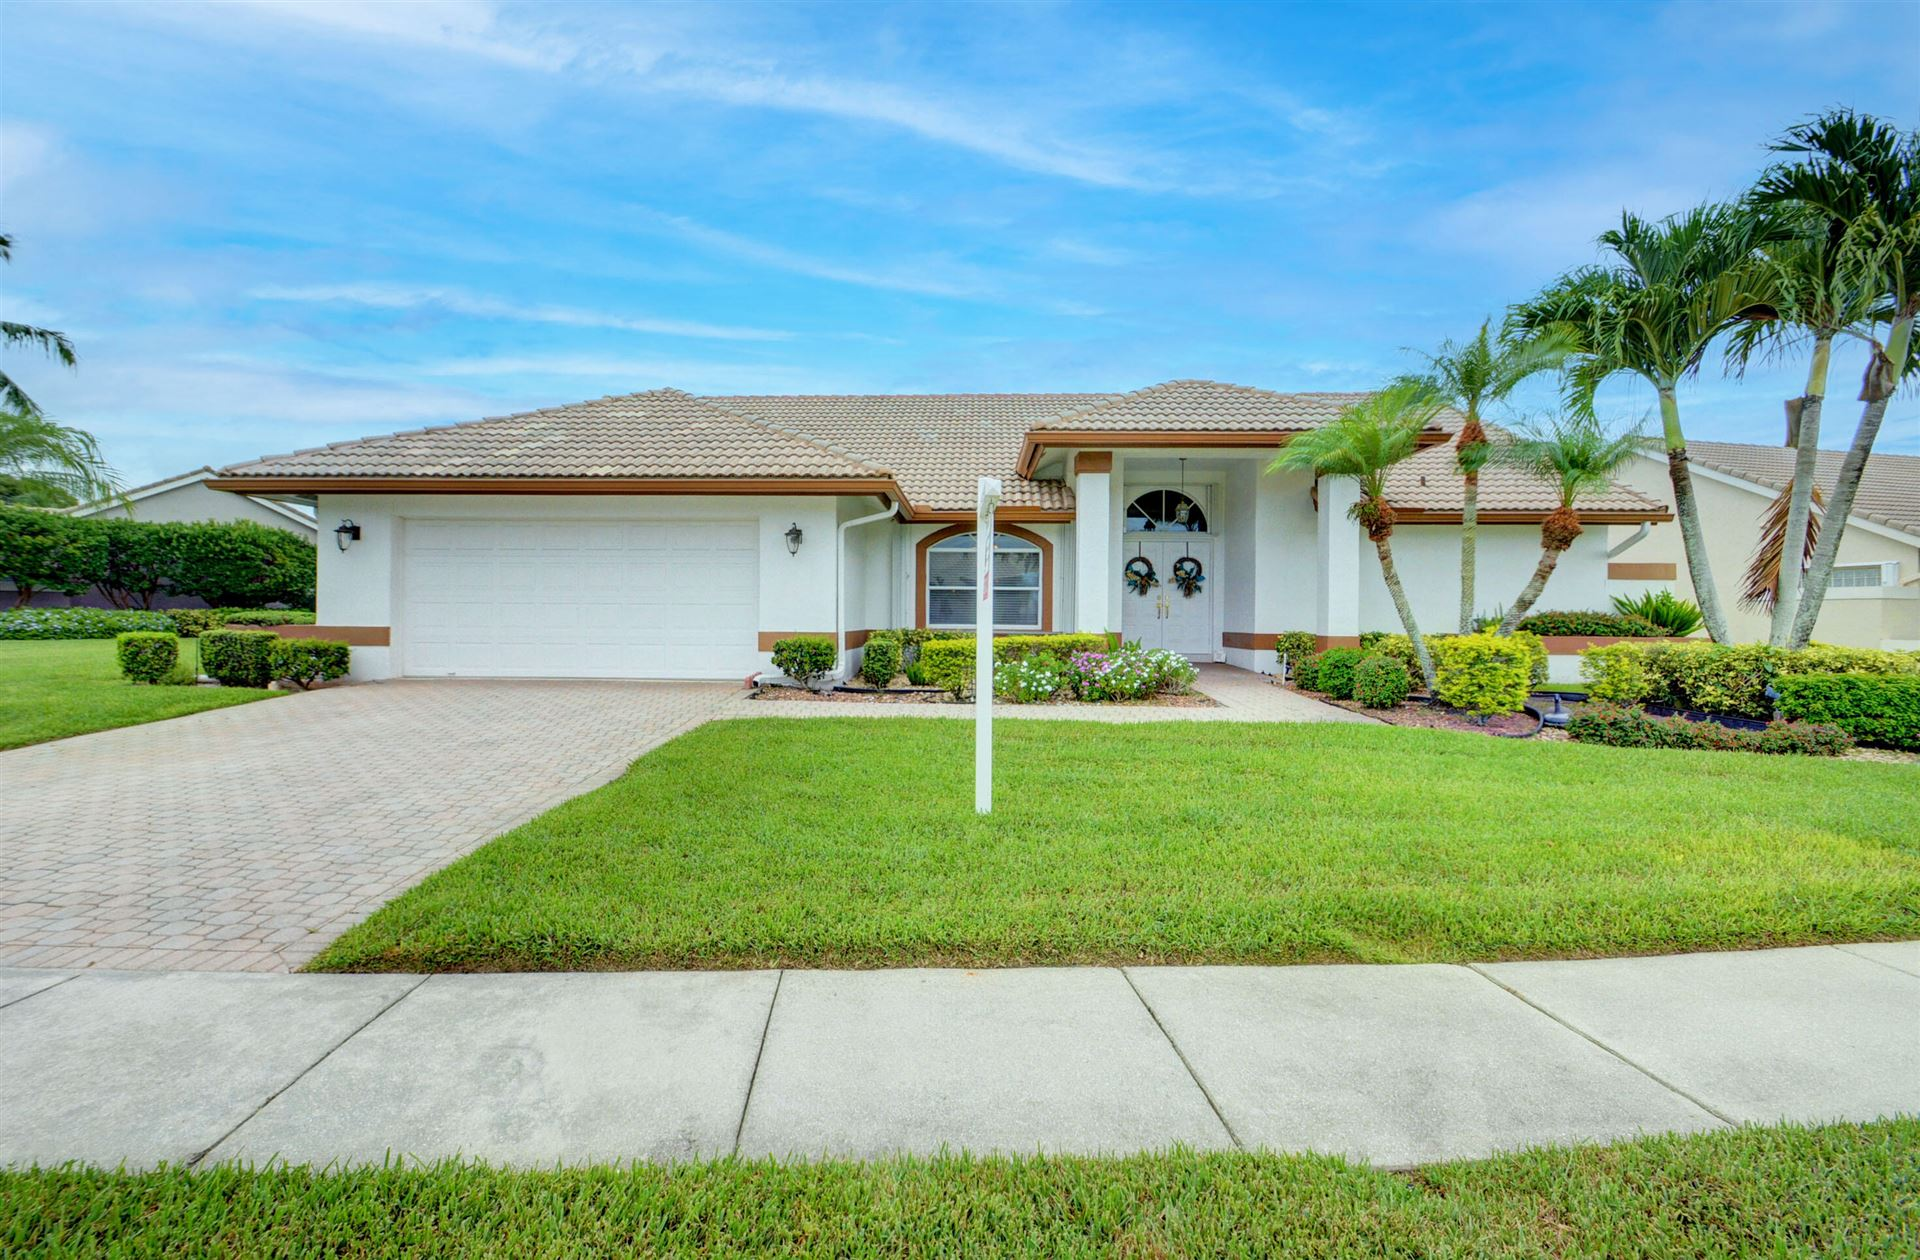 6339 Blue Bay Circle, Lake Worth, FL 33467 - MLS#: RX-10728113